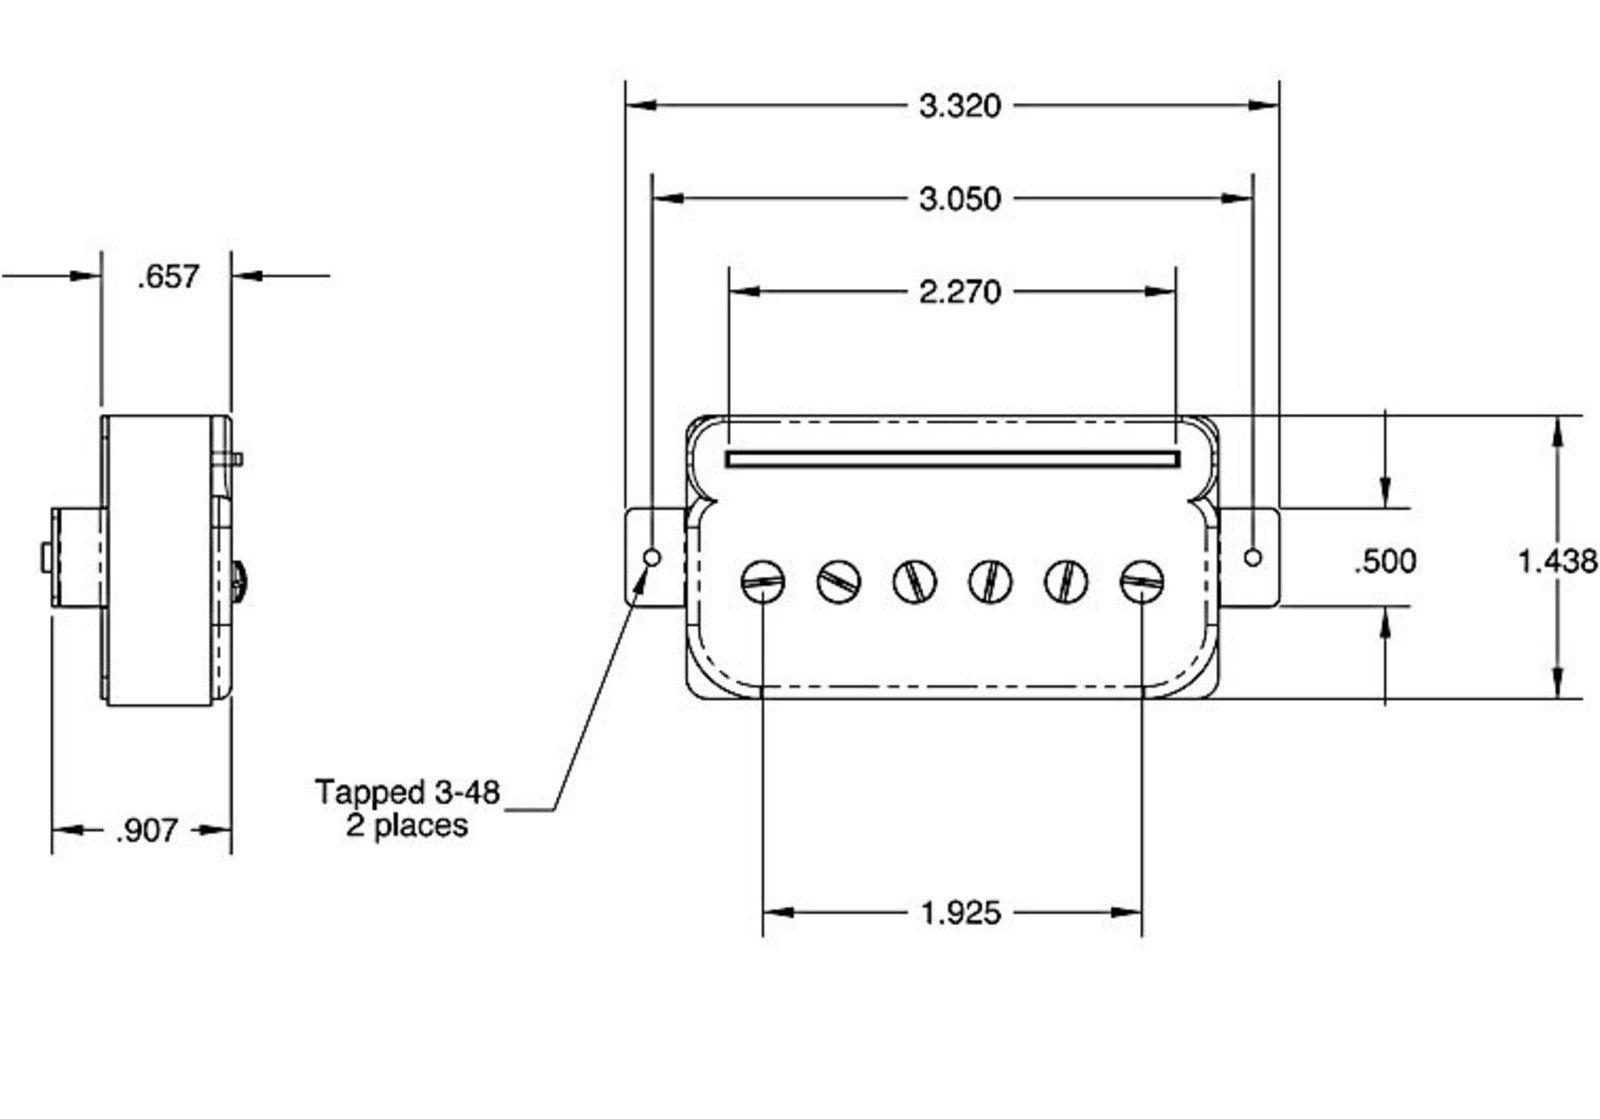 Fender Humbucker Pickup Wiring